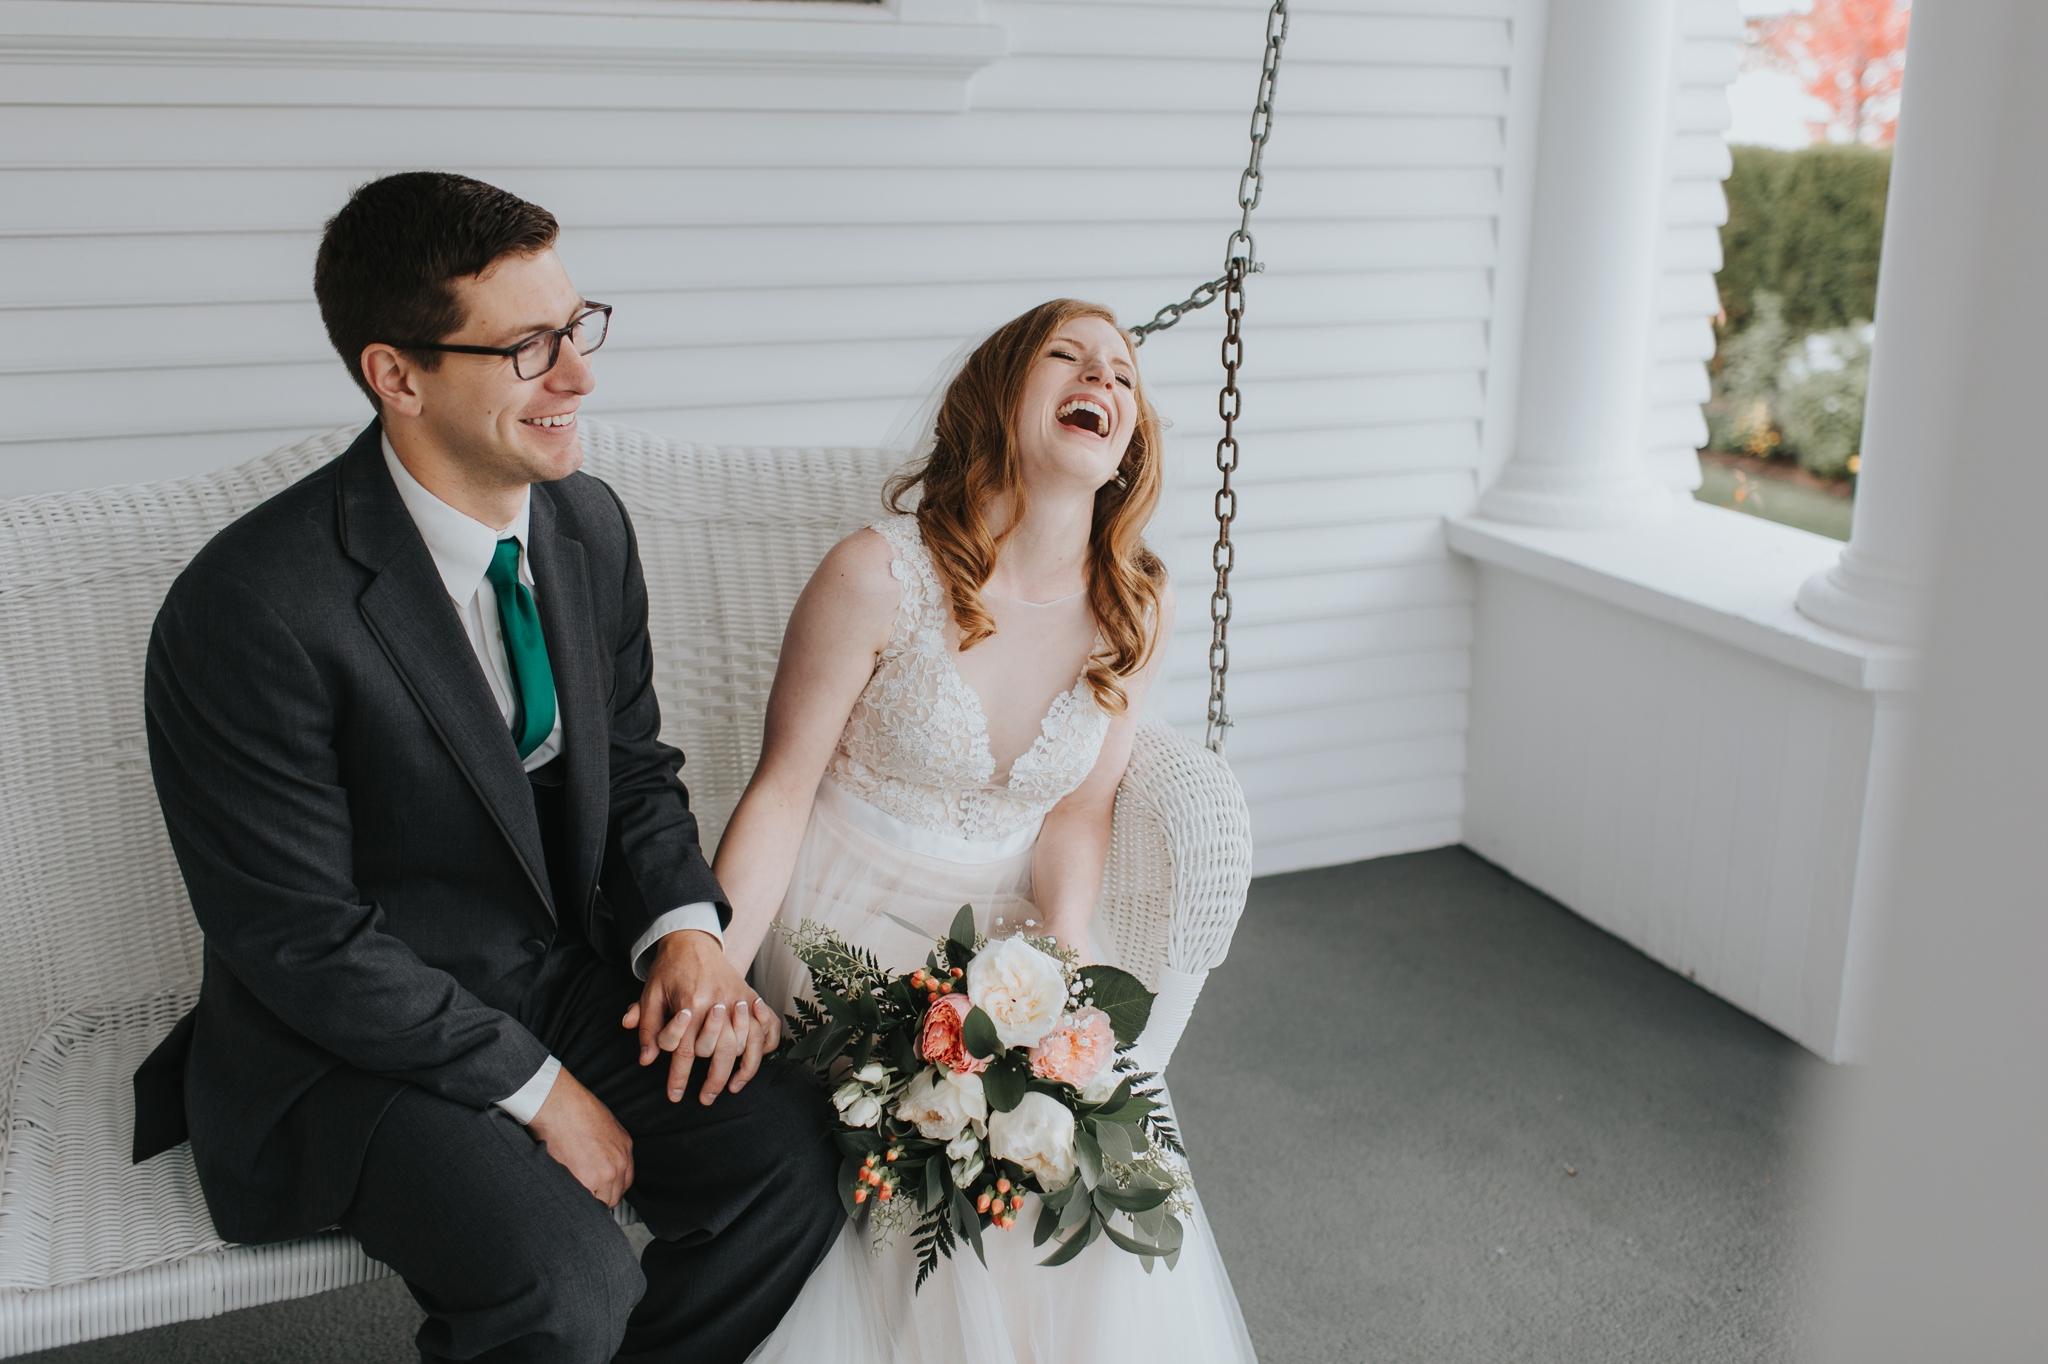 Glenna+++Mat_MIssoula+Wedding+Photographer+23.jpg